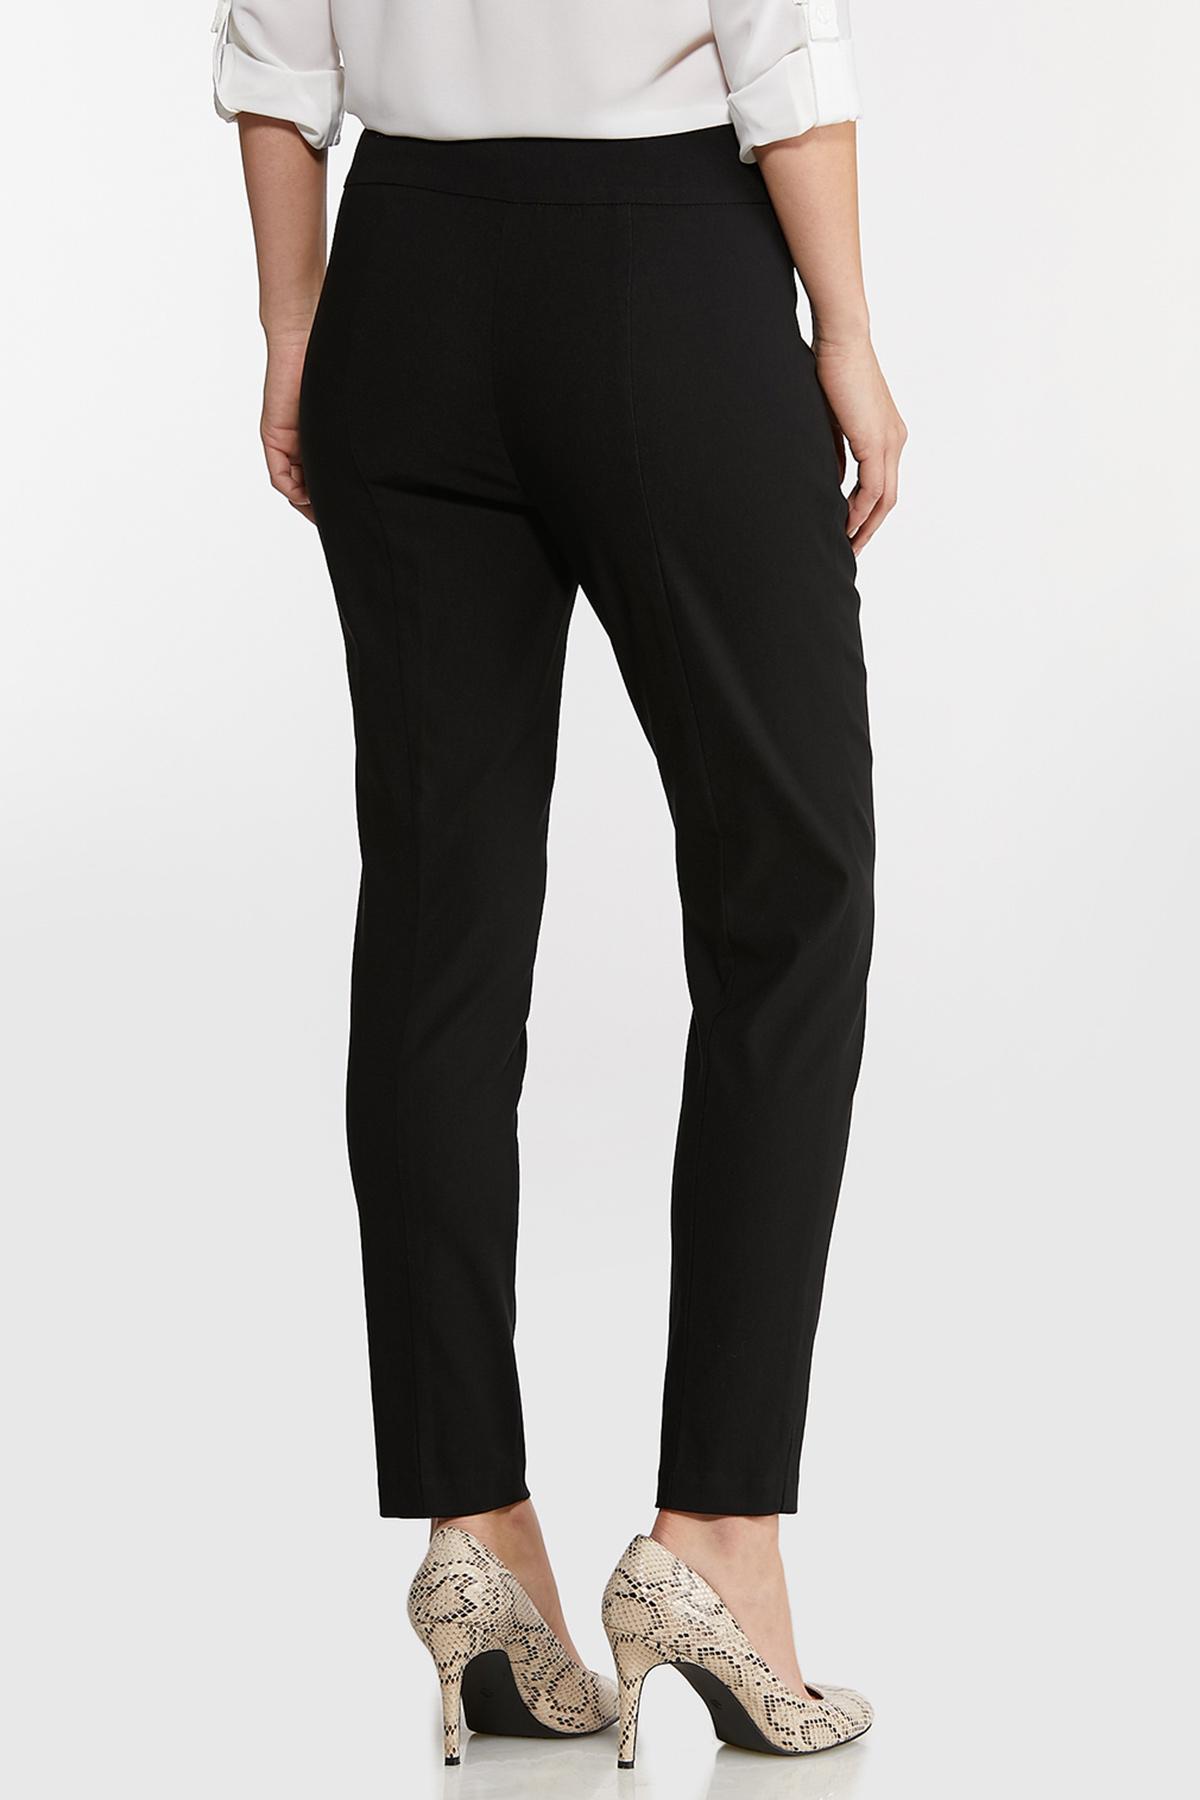 Solid Bengaline Slim Pants (Item #44789726)